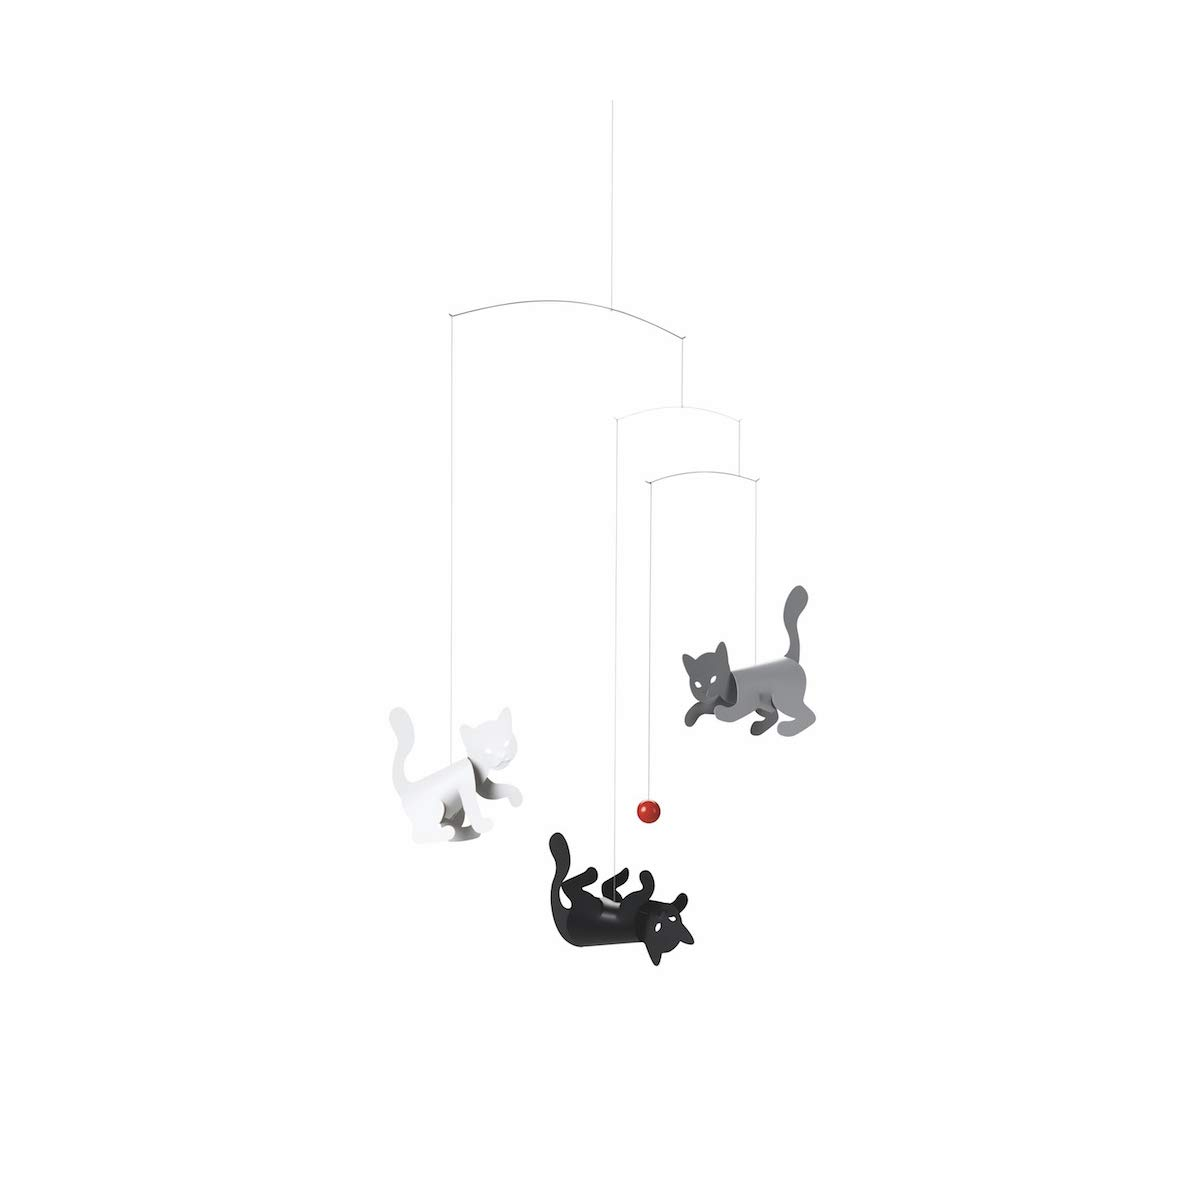 Kitty Mobile Cats Cats Mobile B000WZNZR8 B000WZNZR8, 堺市:e74fc748 --- ijpba.info